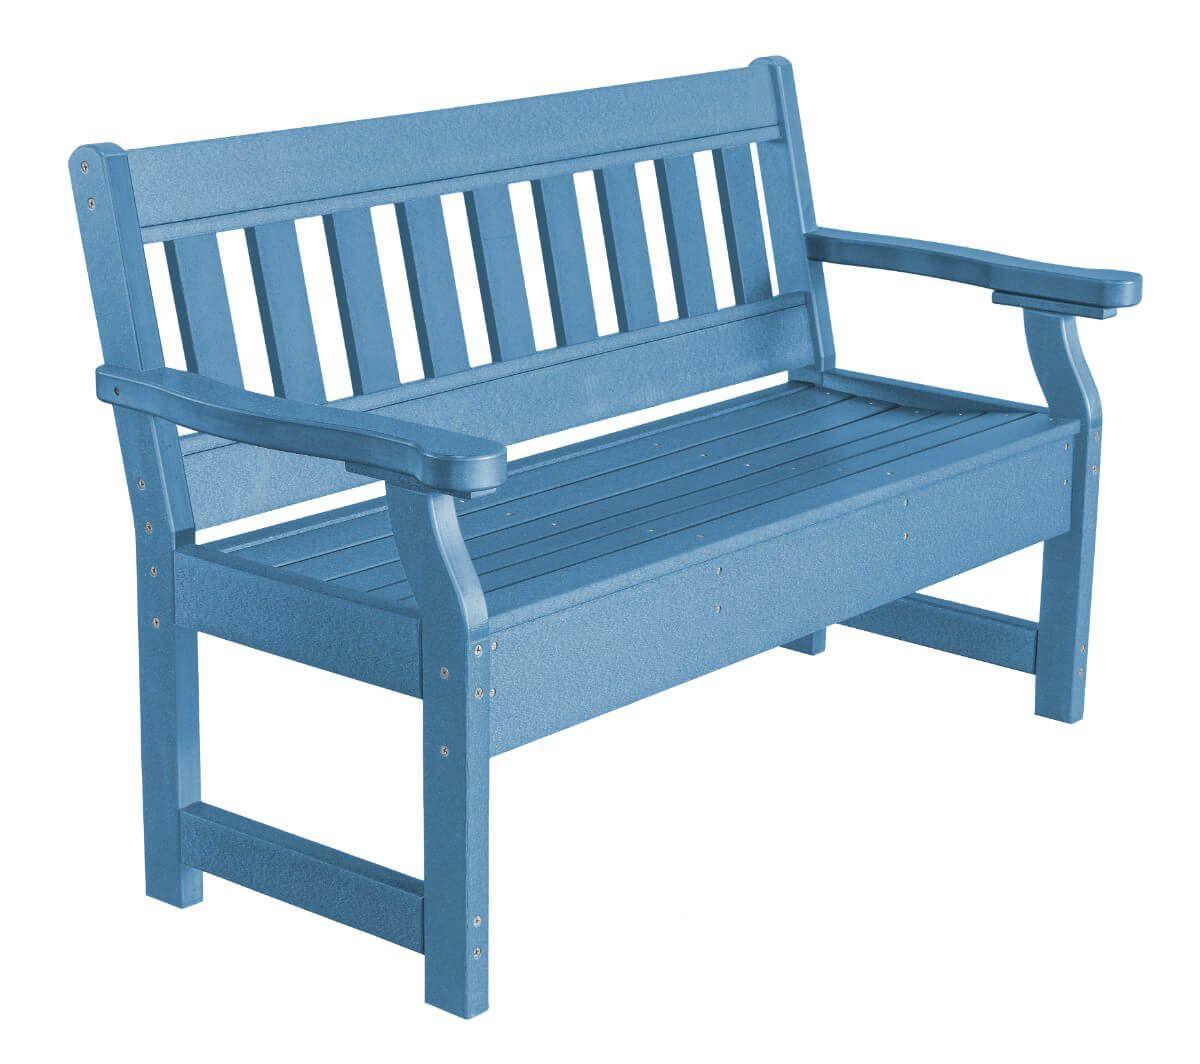 Powder Blue Aden Garden Bench